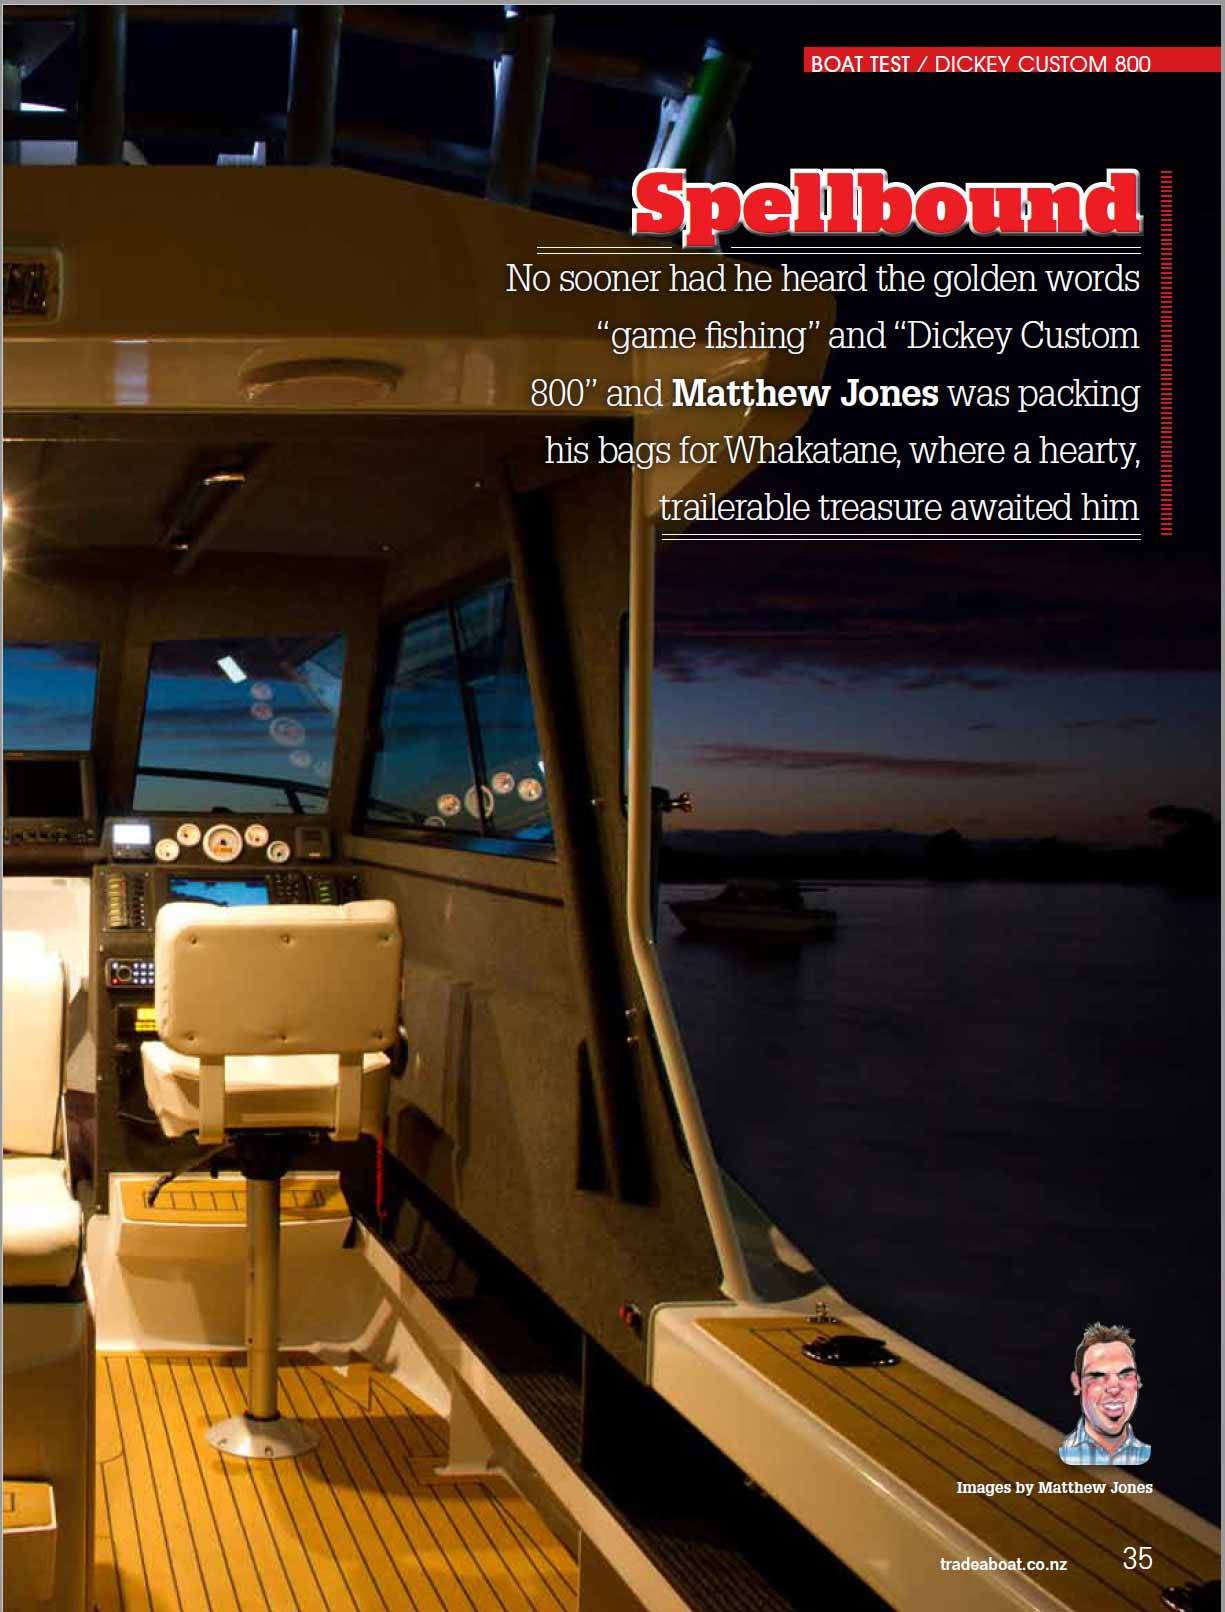 Dickey Custom 800 review - Tradeaboat